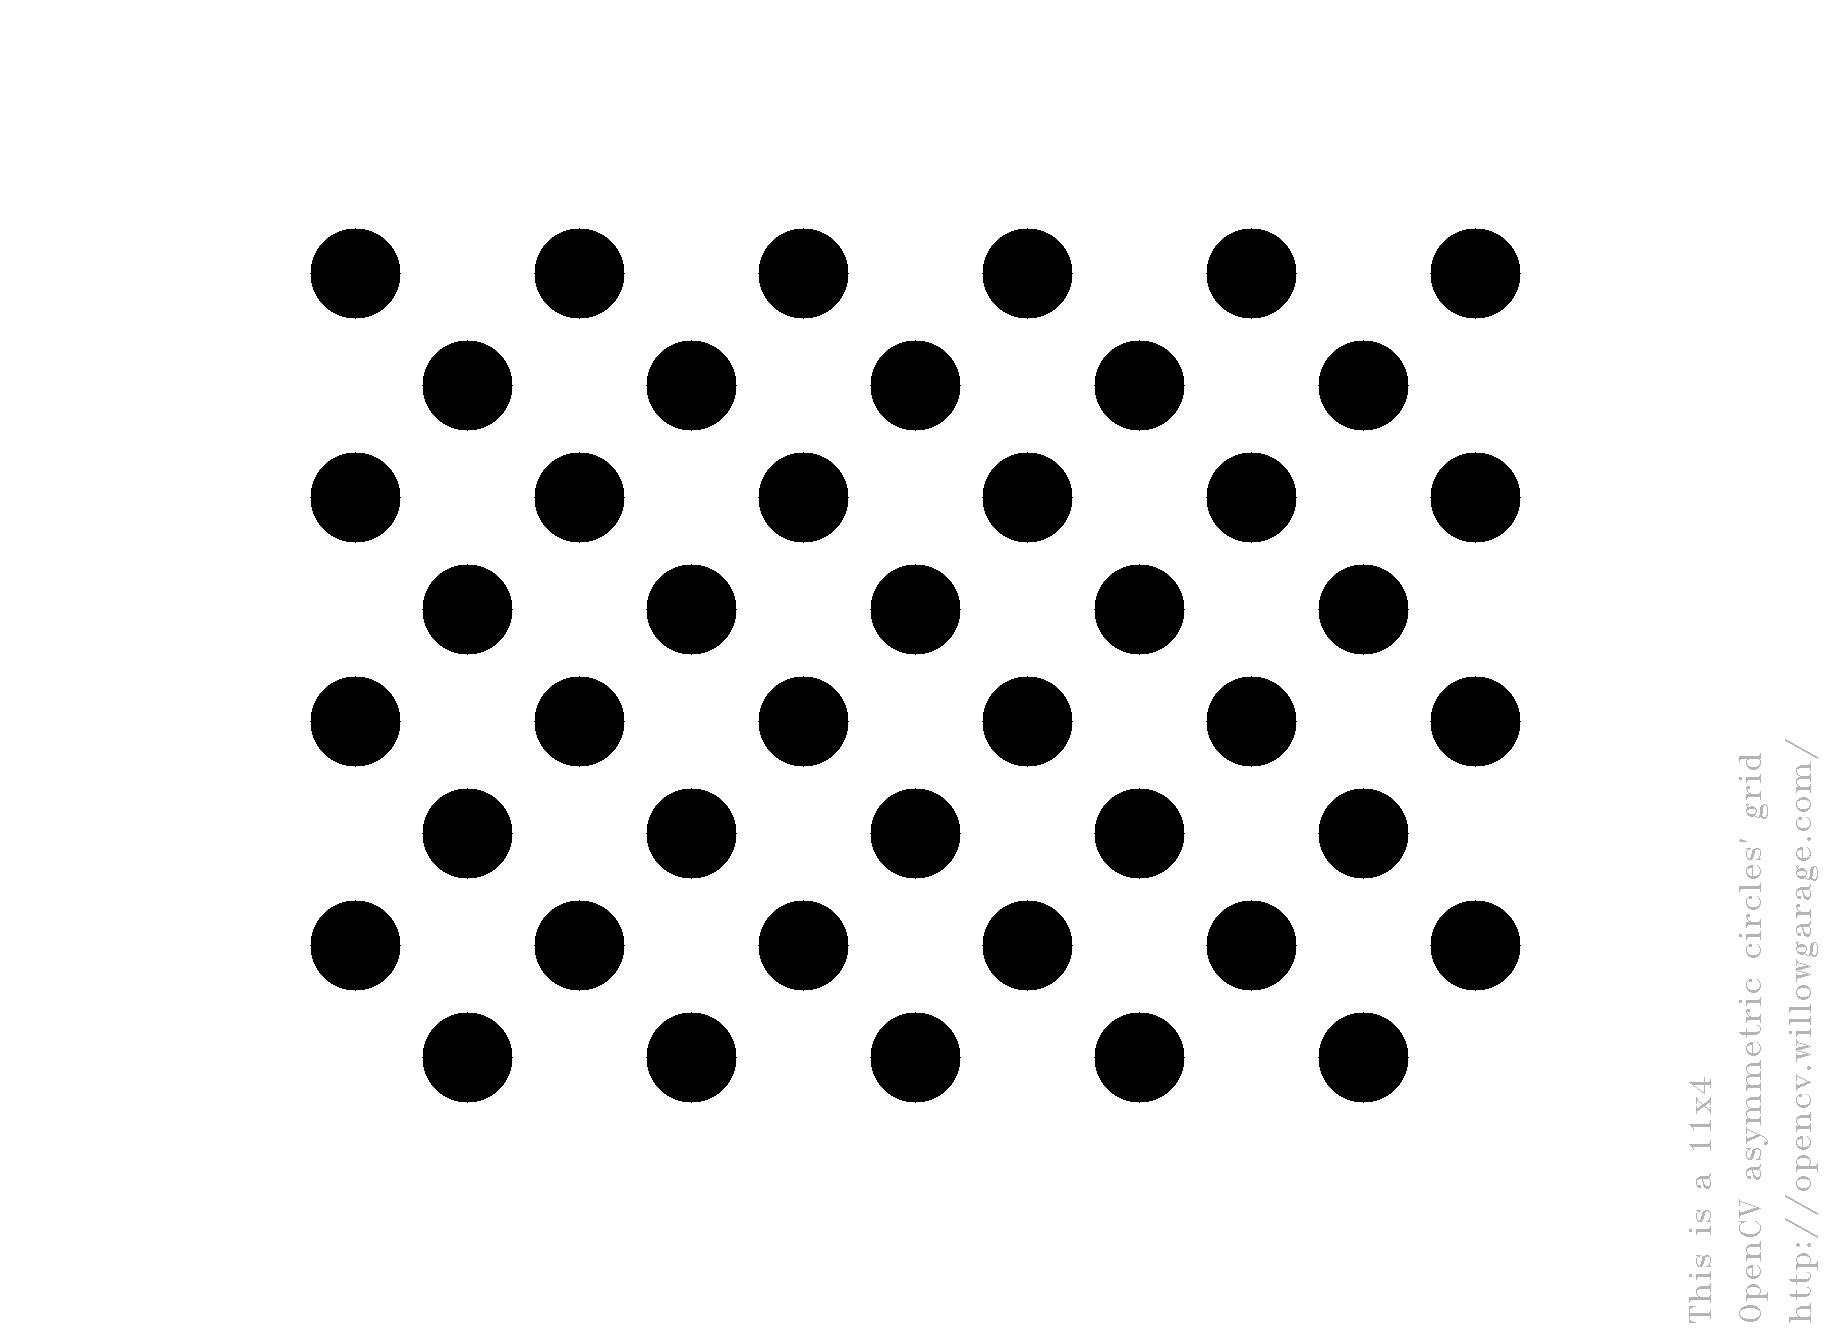 Calibrate fisheye lens - ofxCv - beginners - openFrameworks